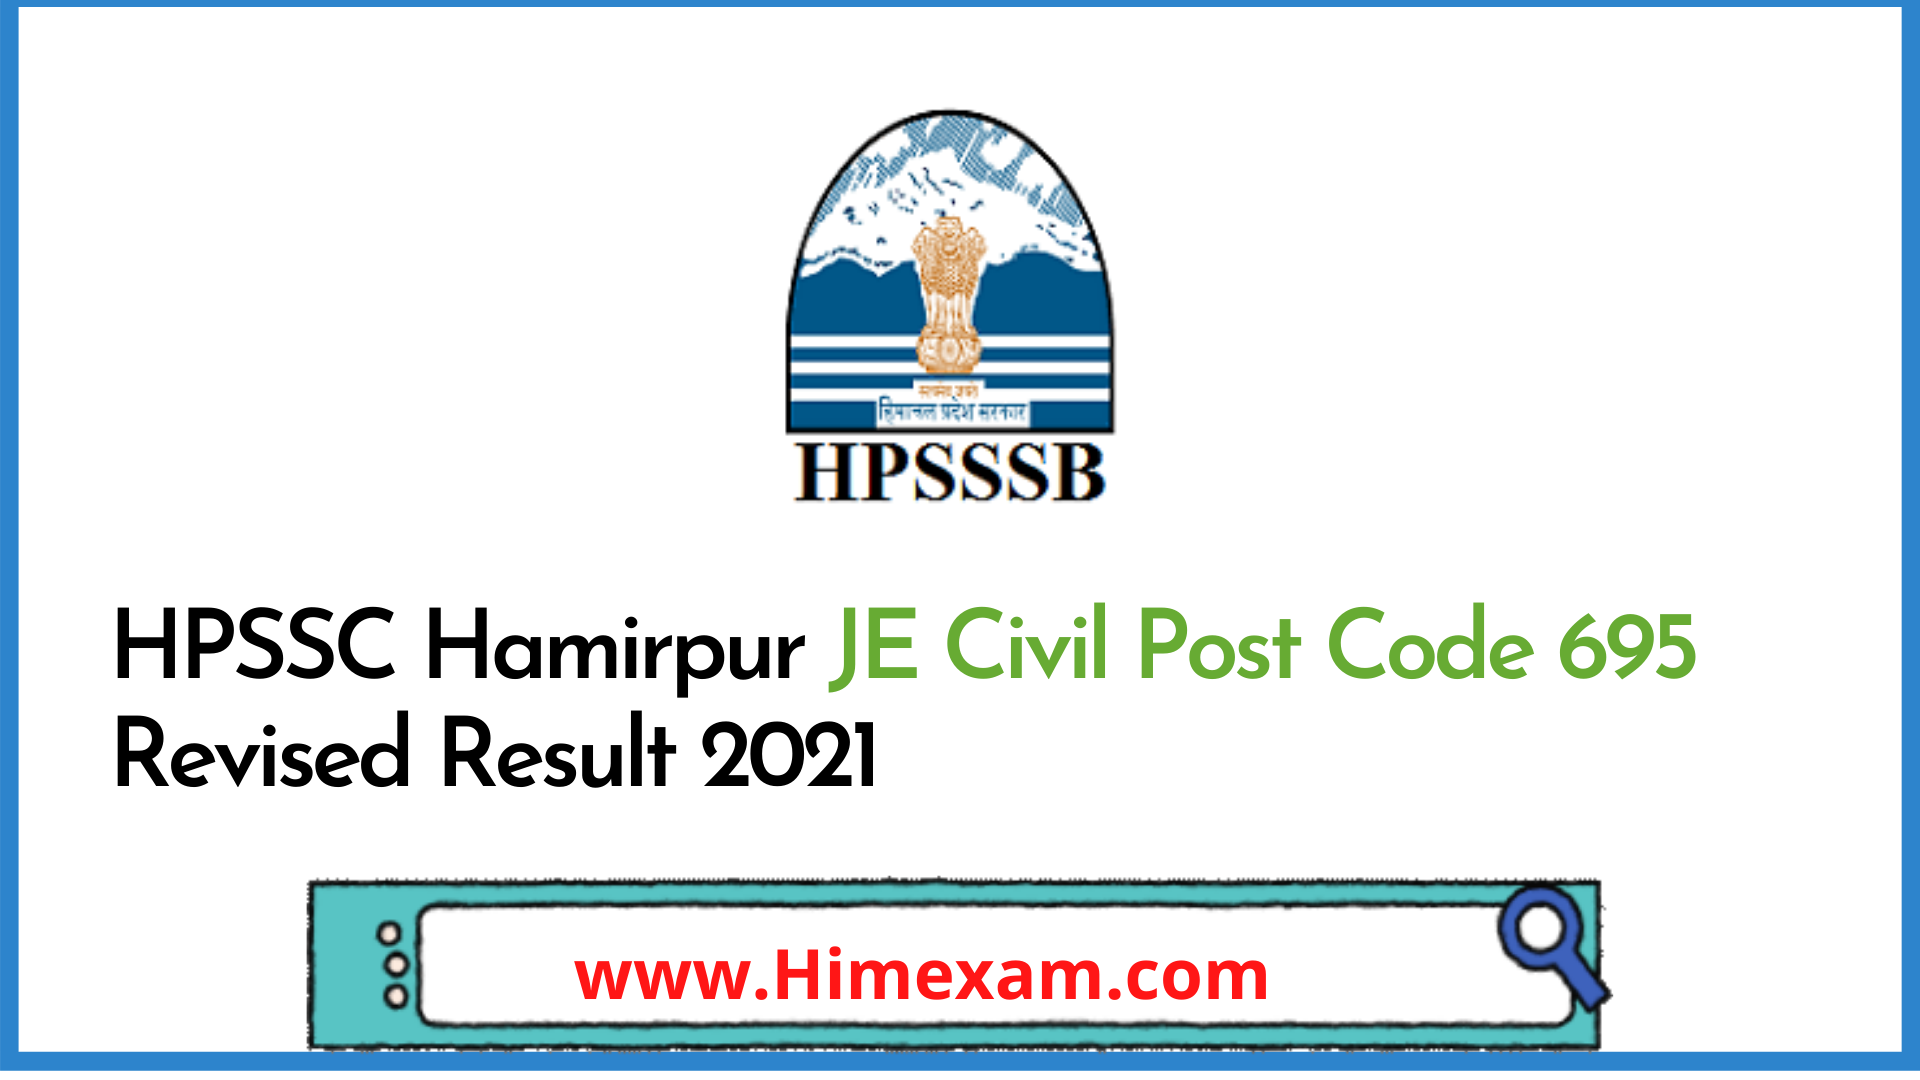 HPSSC Hamirpur JE Civil Post Code 695 Revised Result 2021